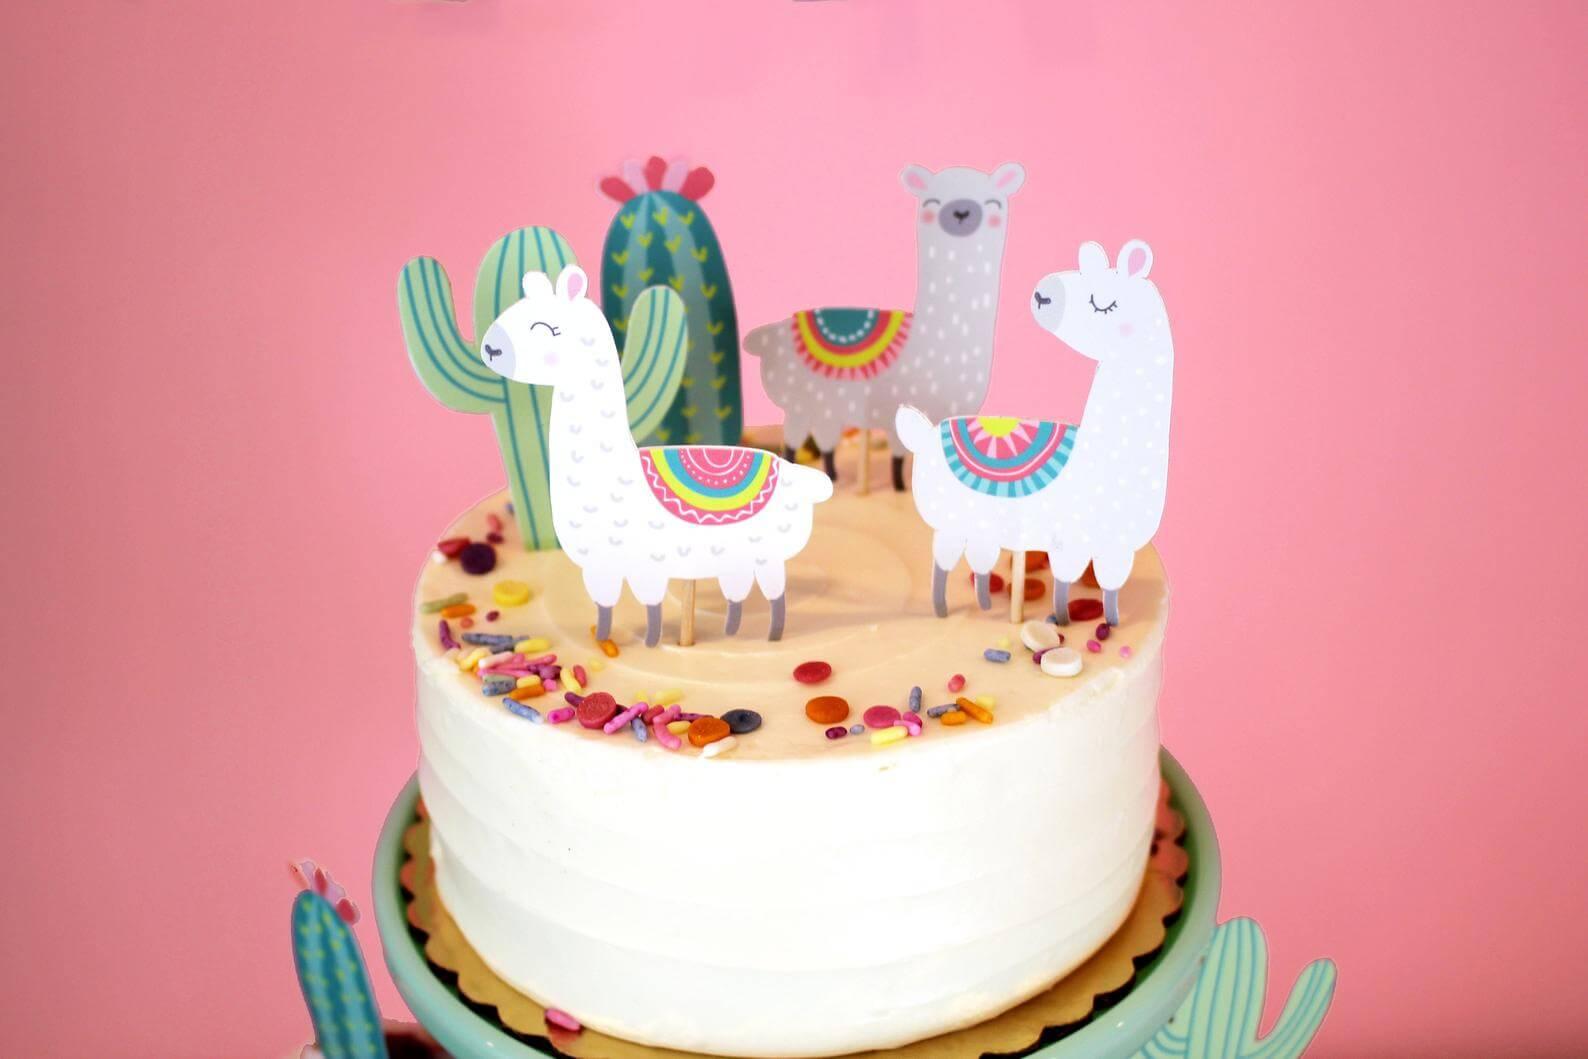 llama party cake ideas